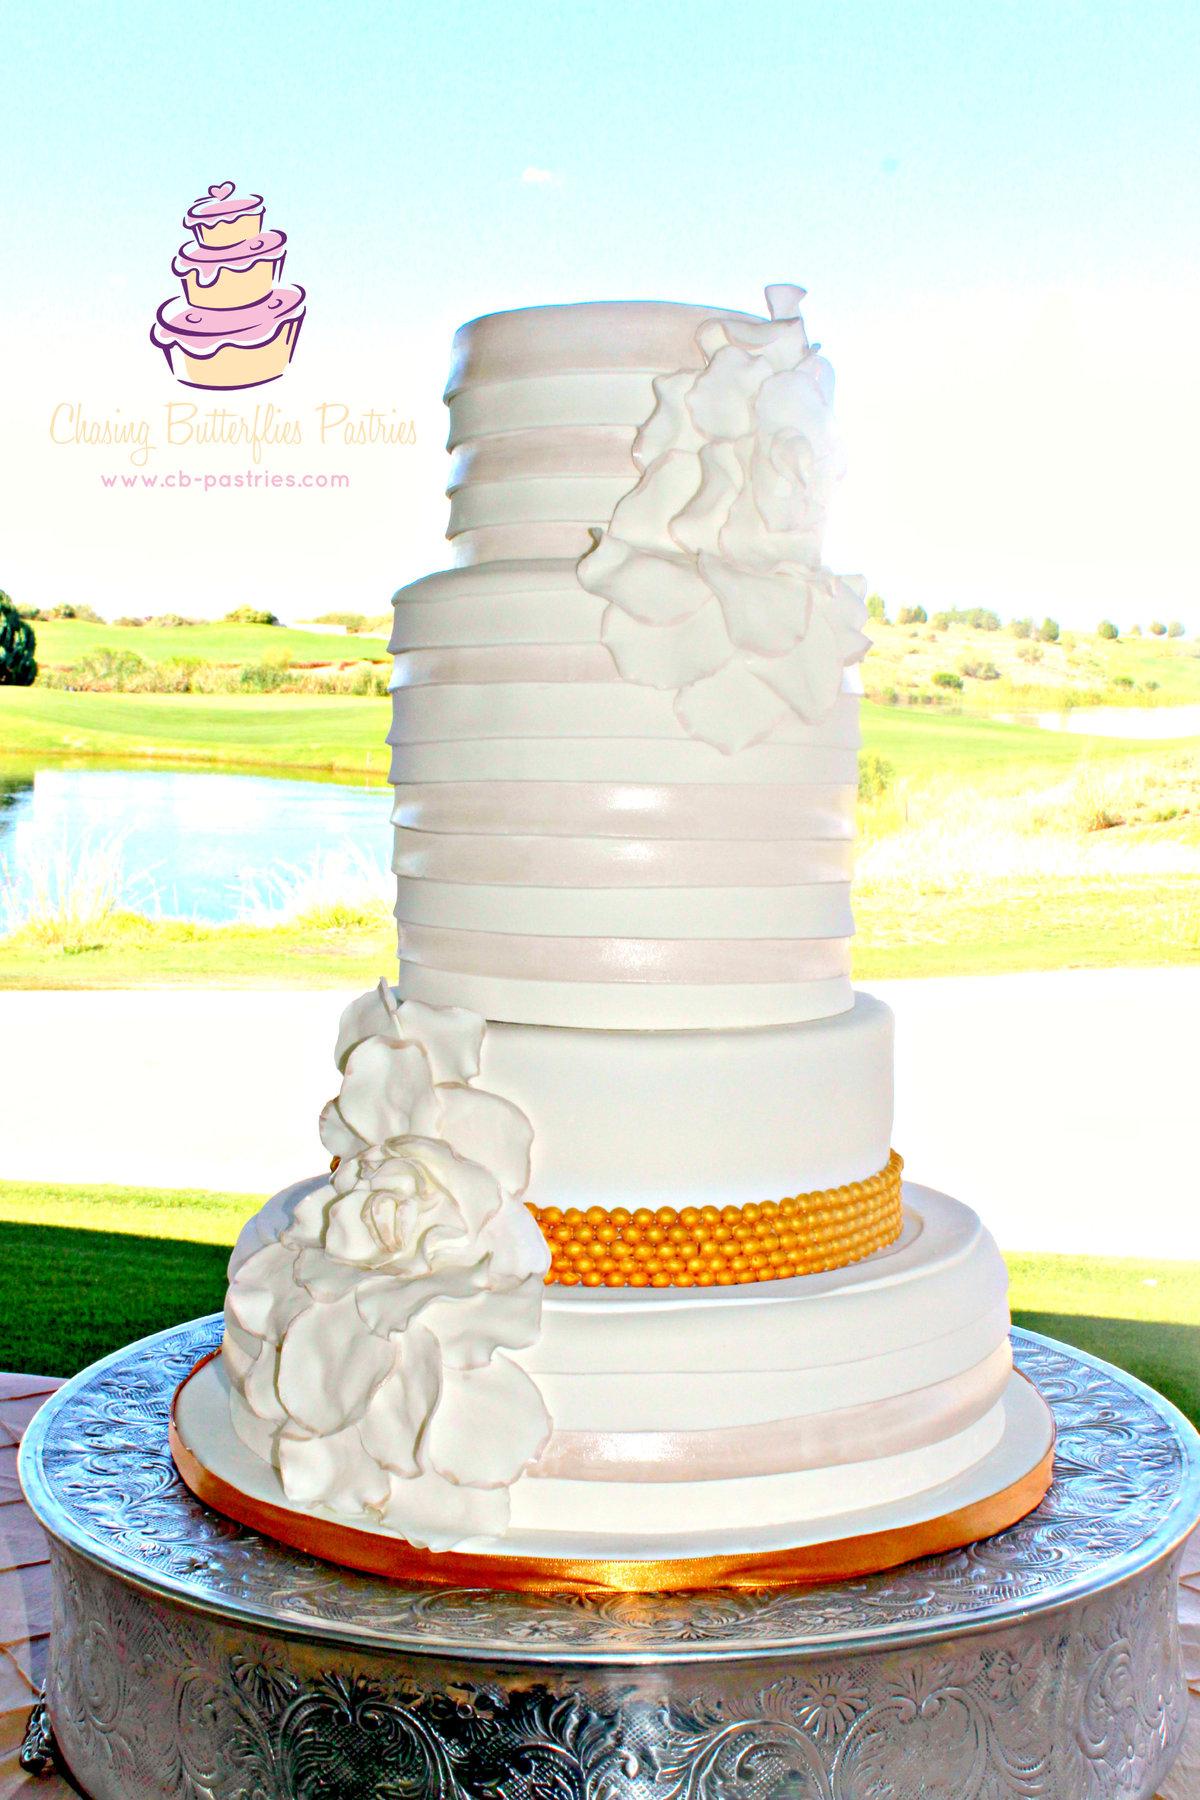 Wedding Cakes El Paso Chasing Butterflies Pastries